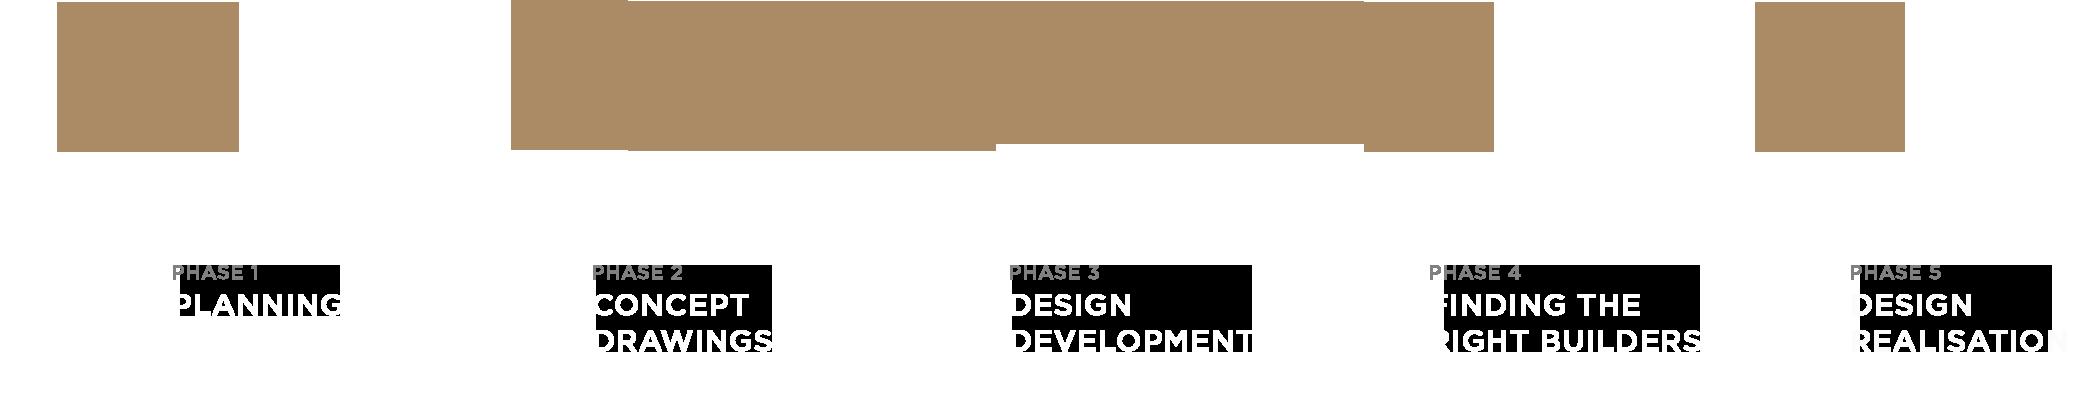 Mal Corboy Design Process Version 02